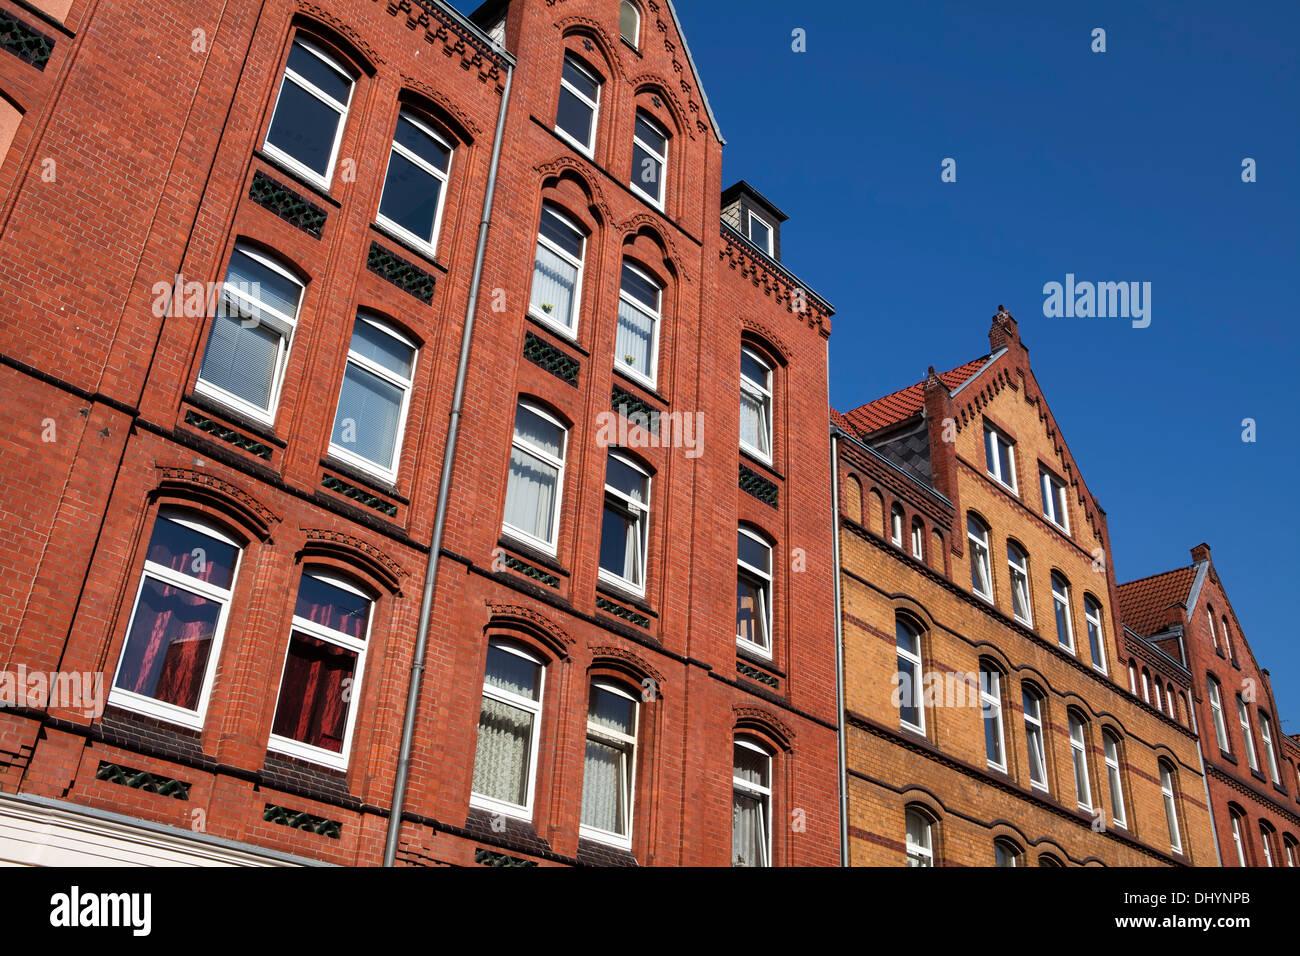 L'architecture historique, Linden, Hanovre, Basse-Saxe, Allemagne, Europe, Photo Stock